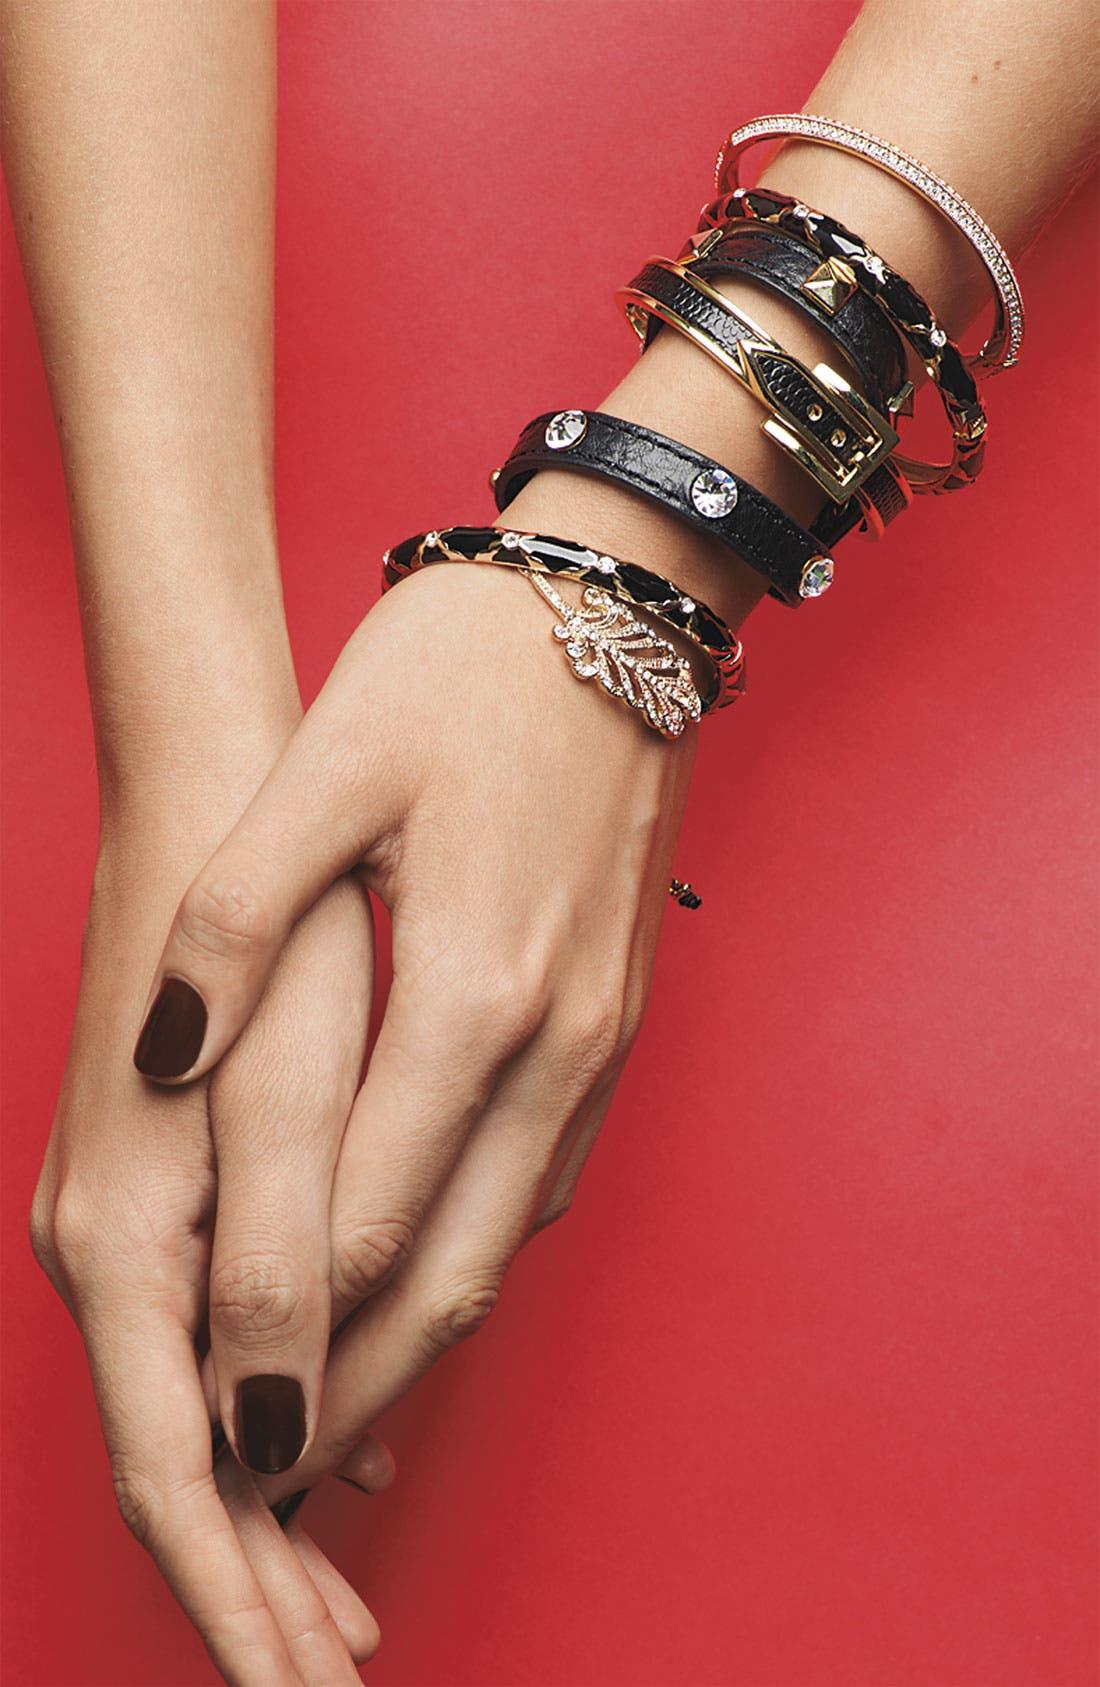 Main Image - Sequin & Cara Accessories Bracelets